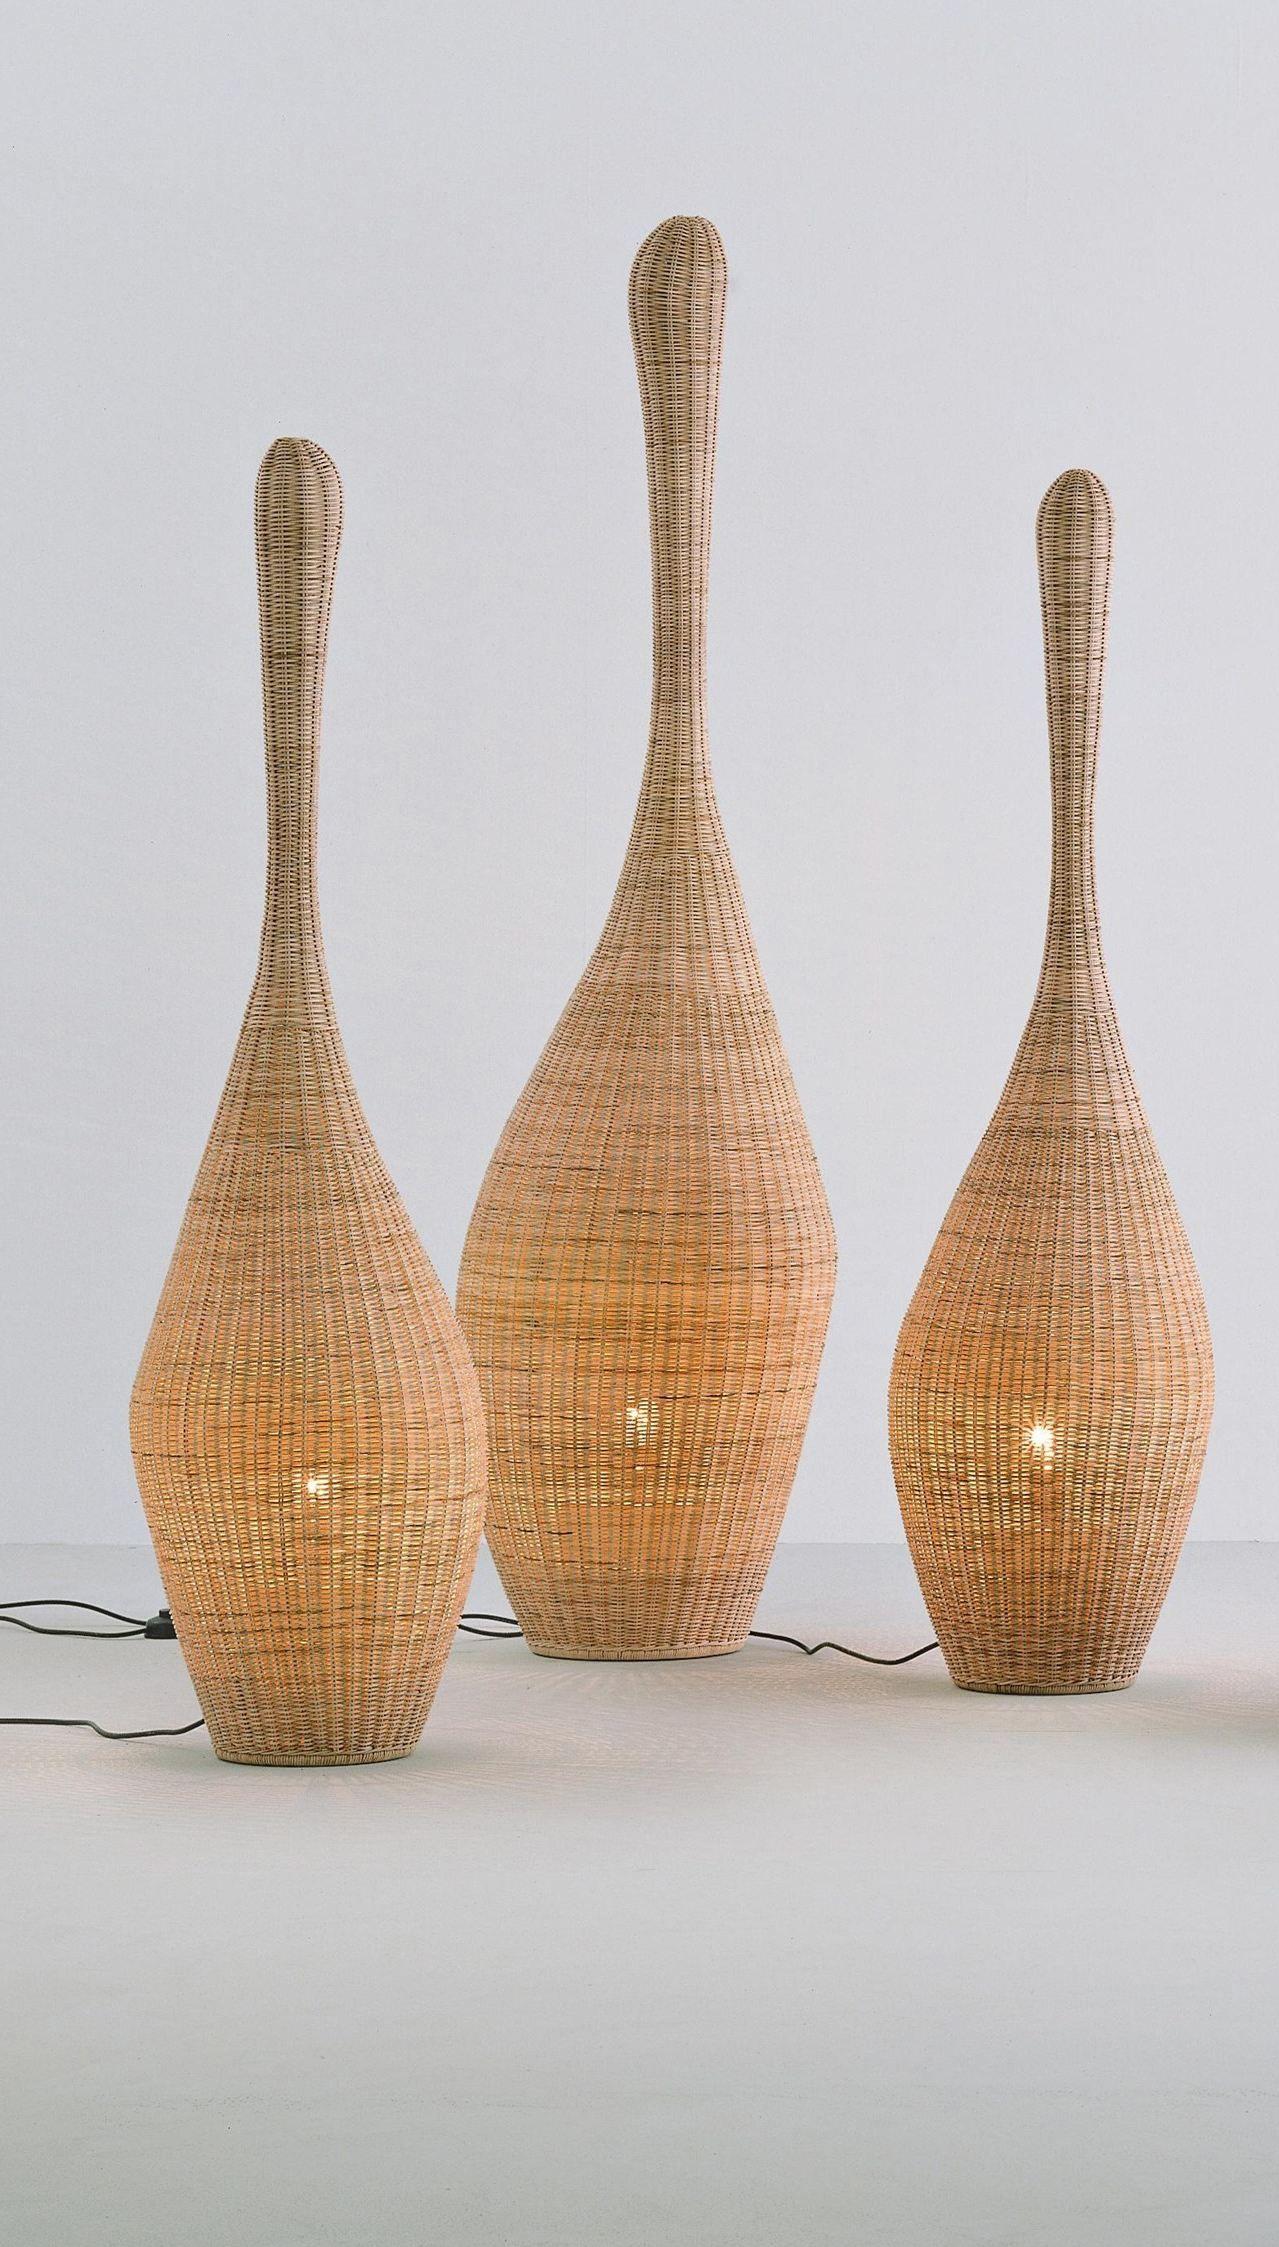 L Anfora Rattan Amphoren Lounge.Bolla Gervasoni Lamp Decor Floor Lamp Lighting